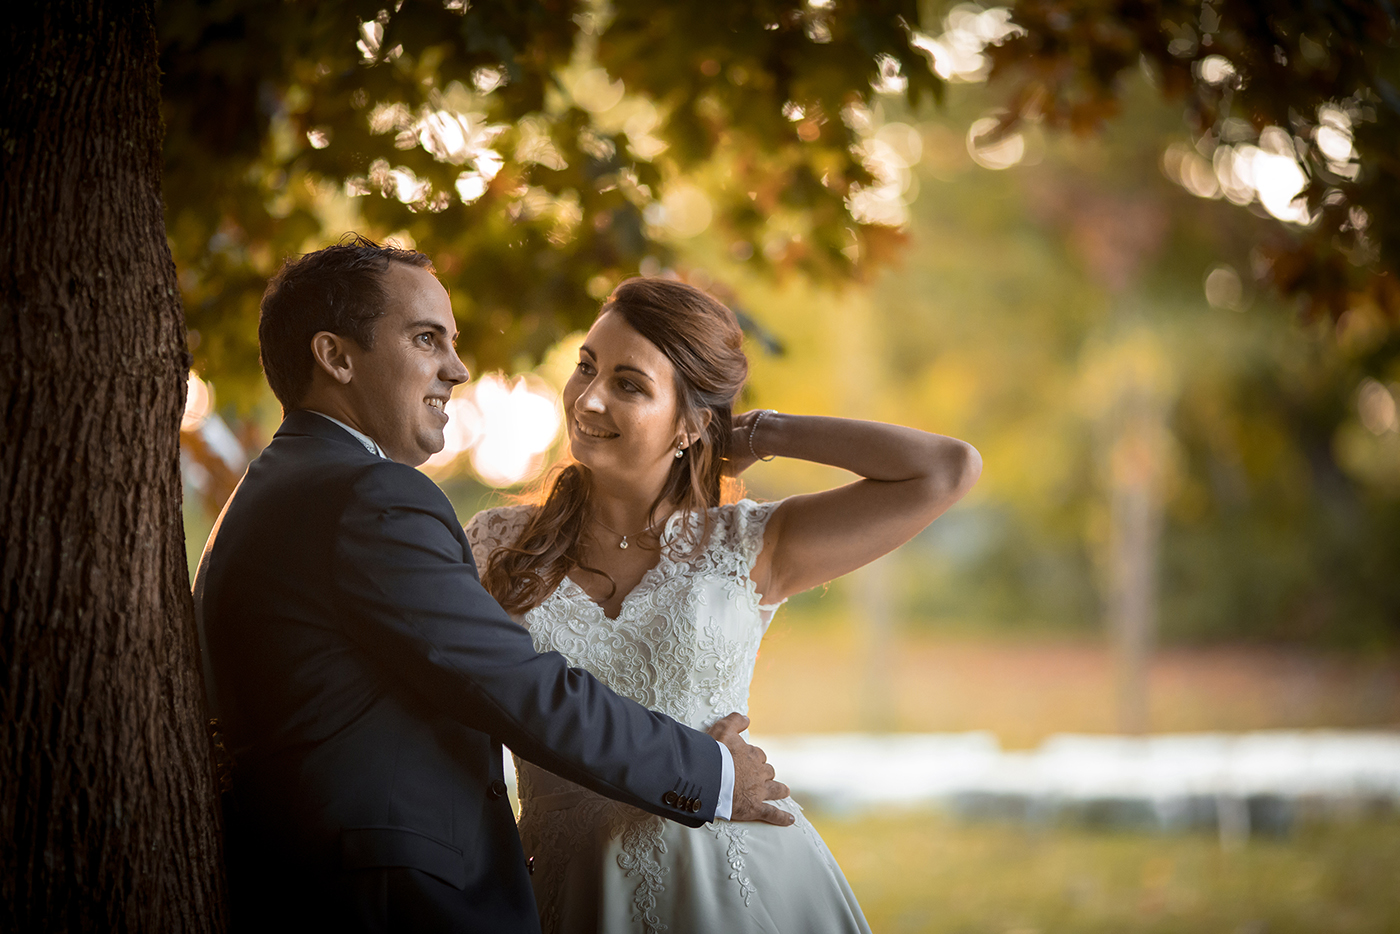 Photographe-mariage-couple-guillaume-heraud-08